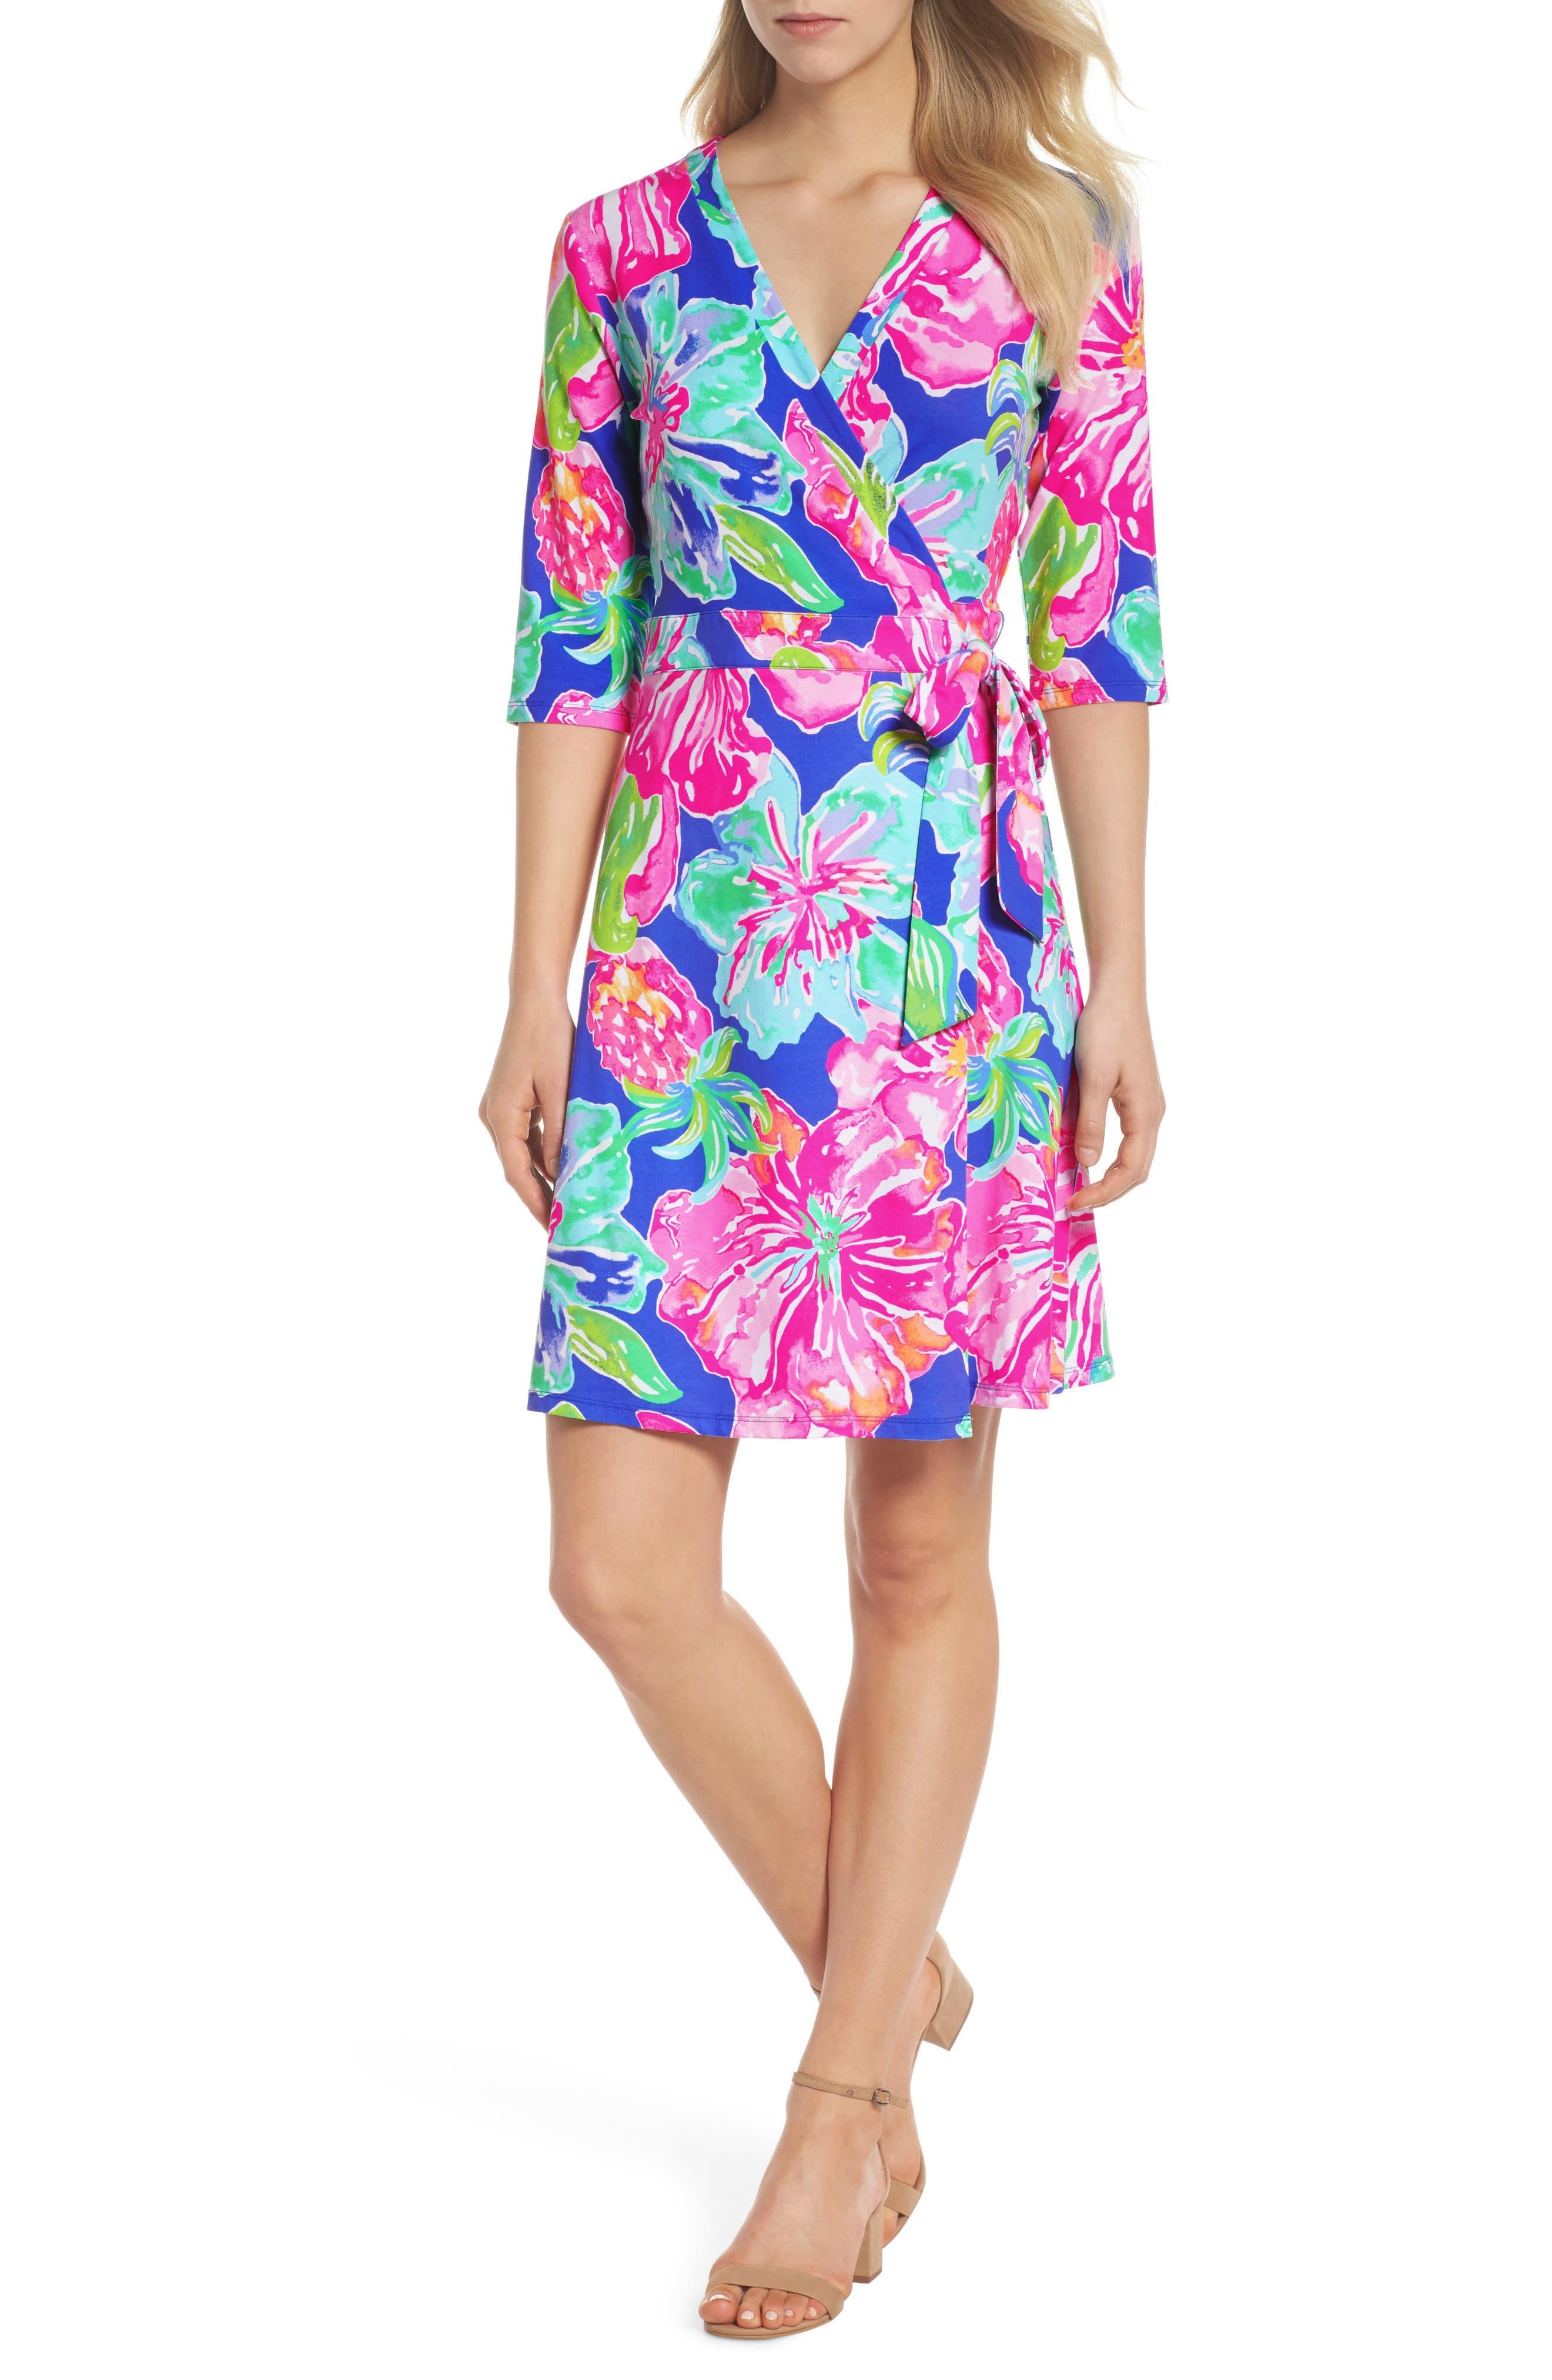 Marvista Wrap Dress,                             Main thumbnail 1, color,                             Beckon Blue Jungle Utopia